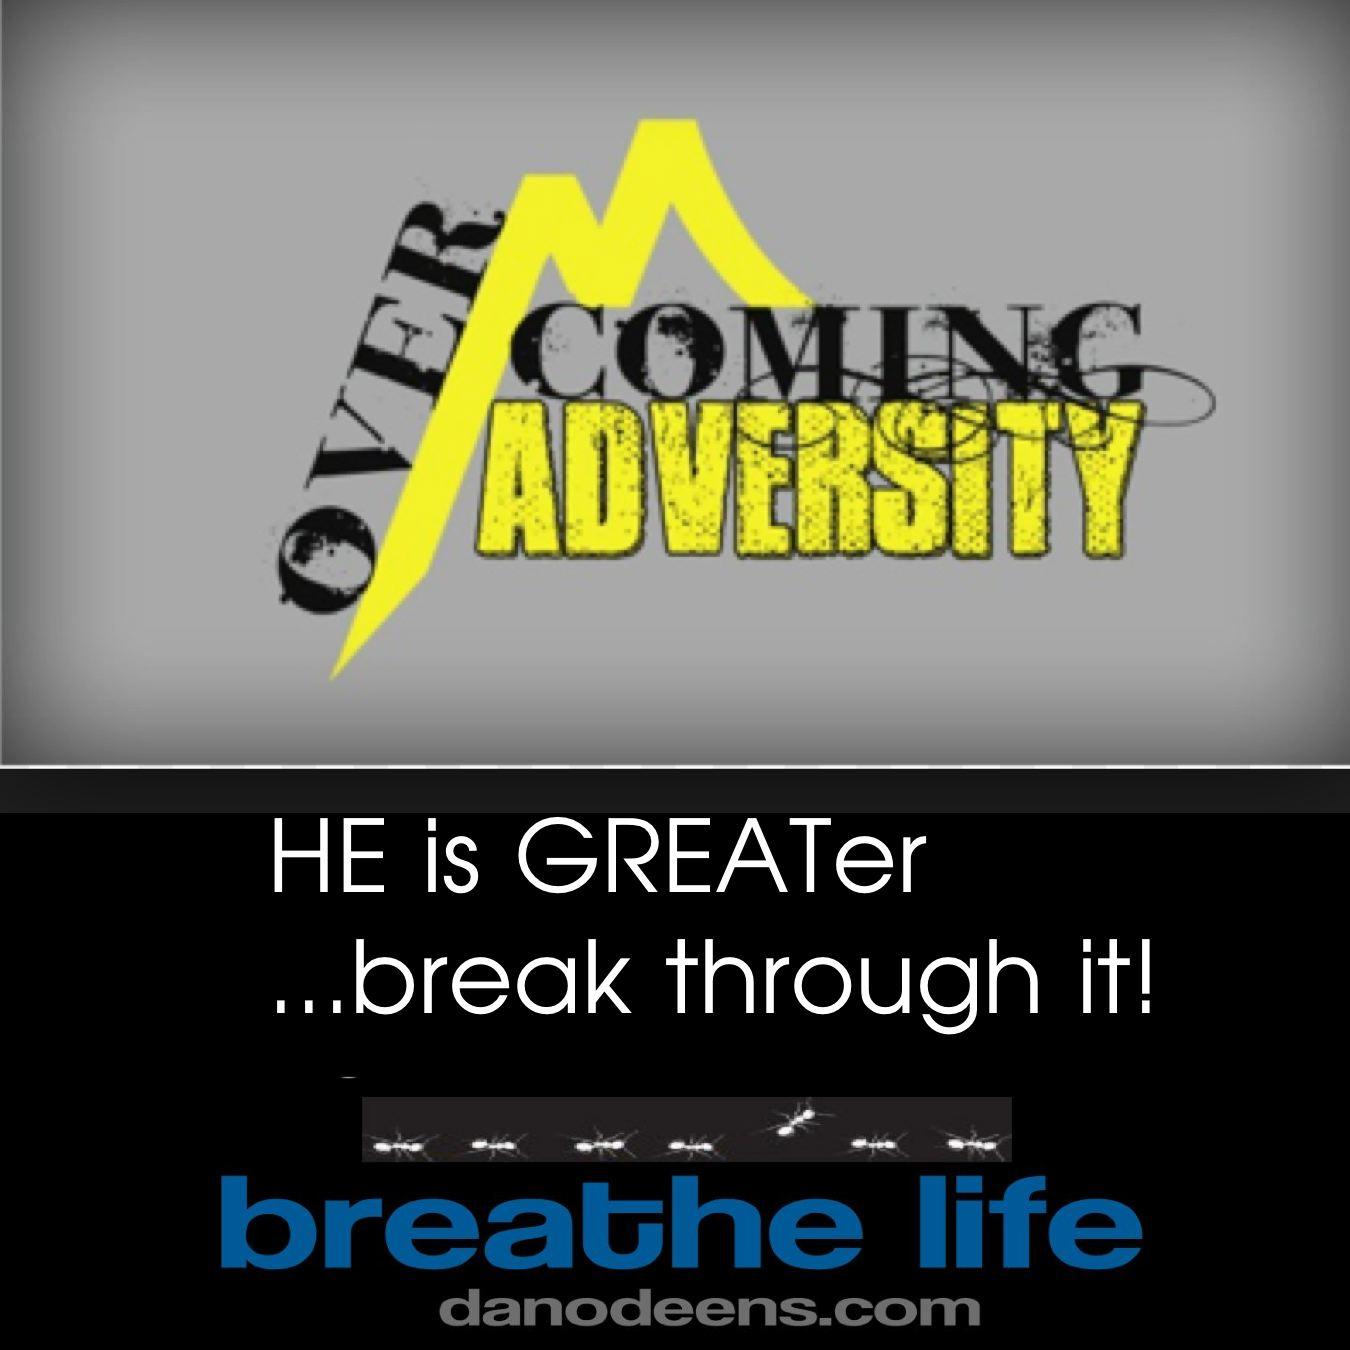 break through it